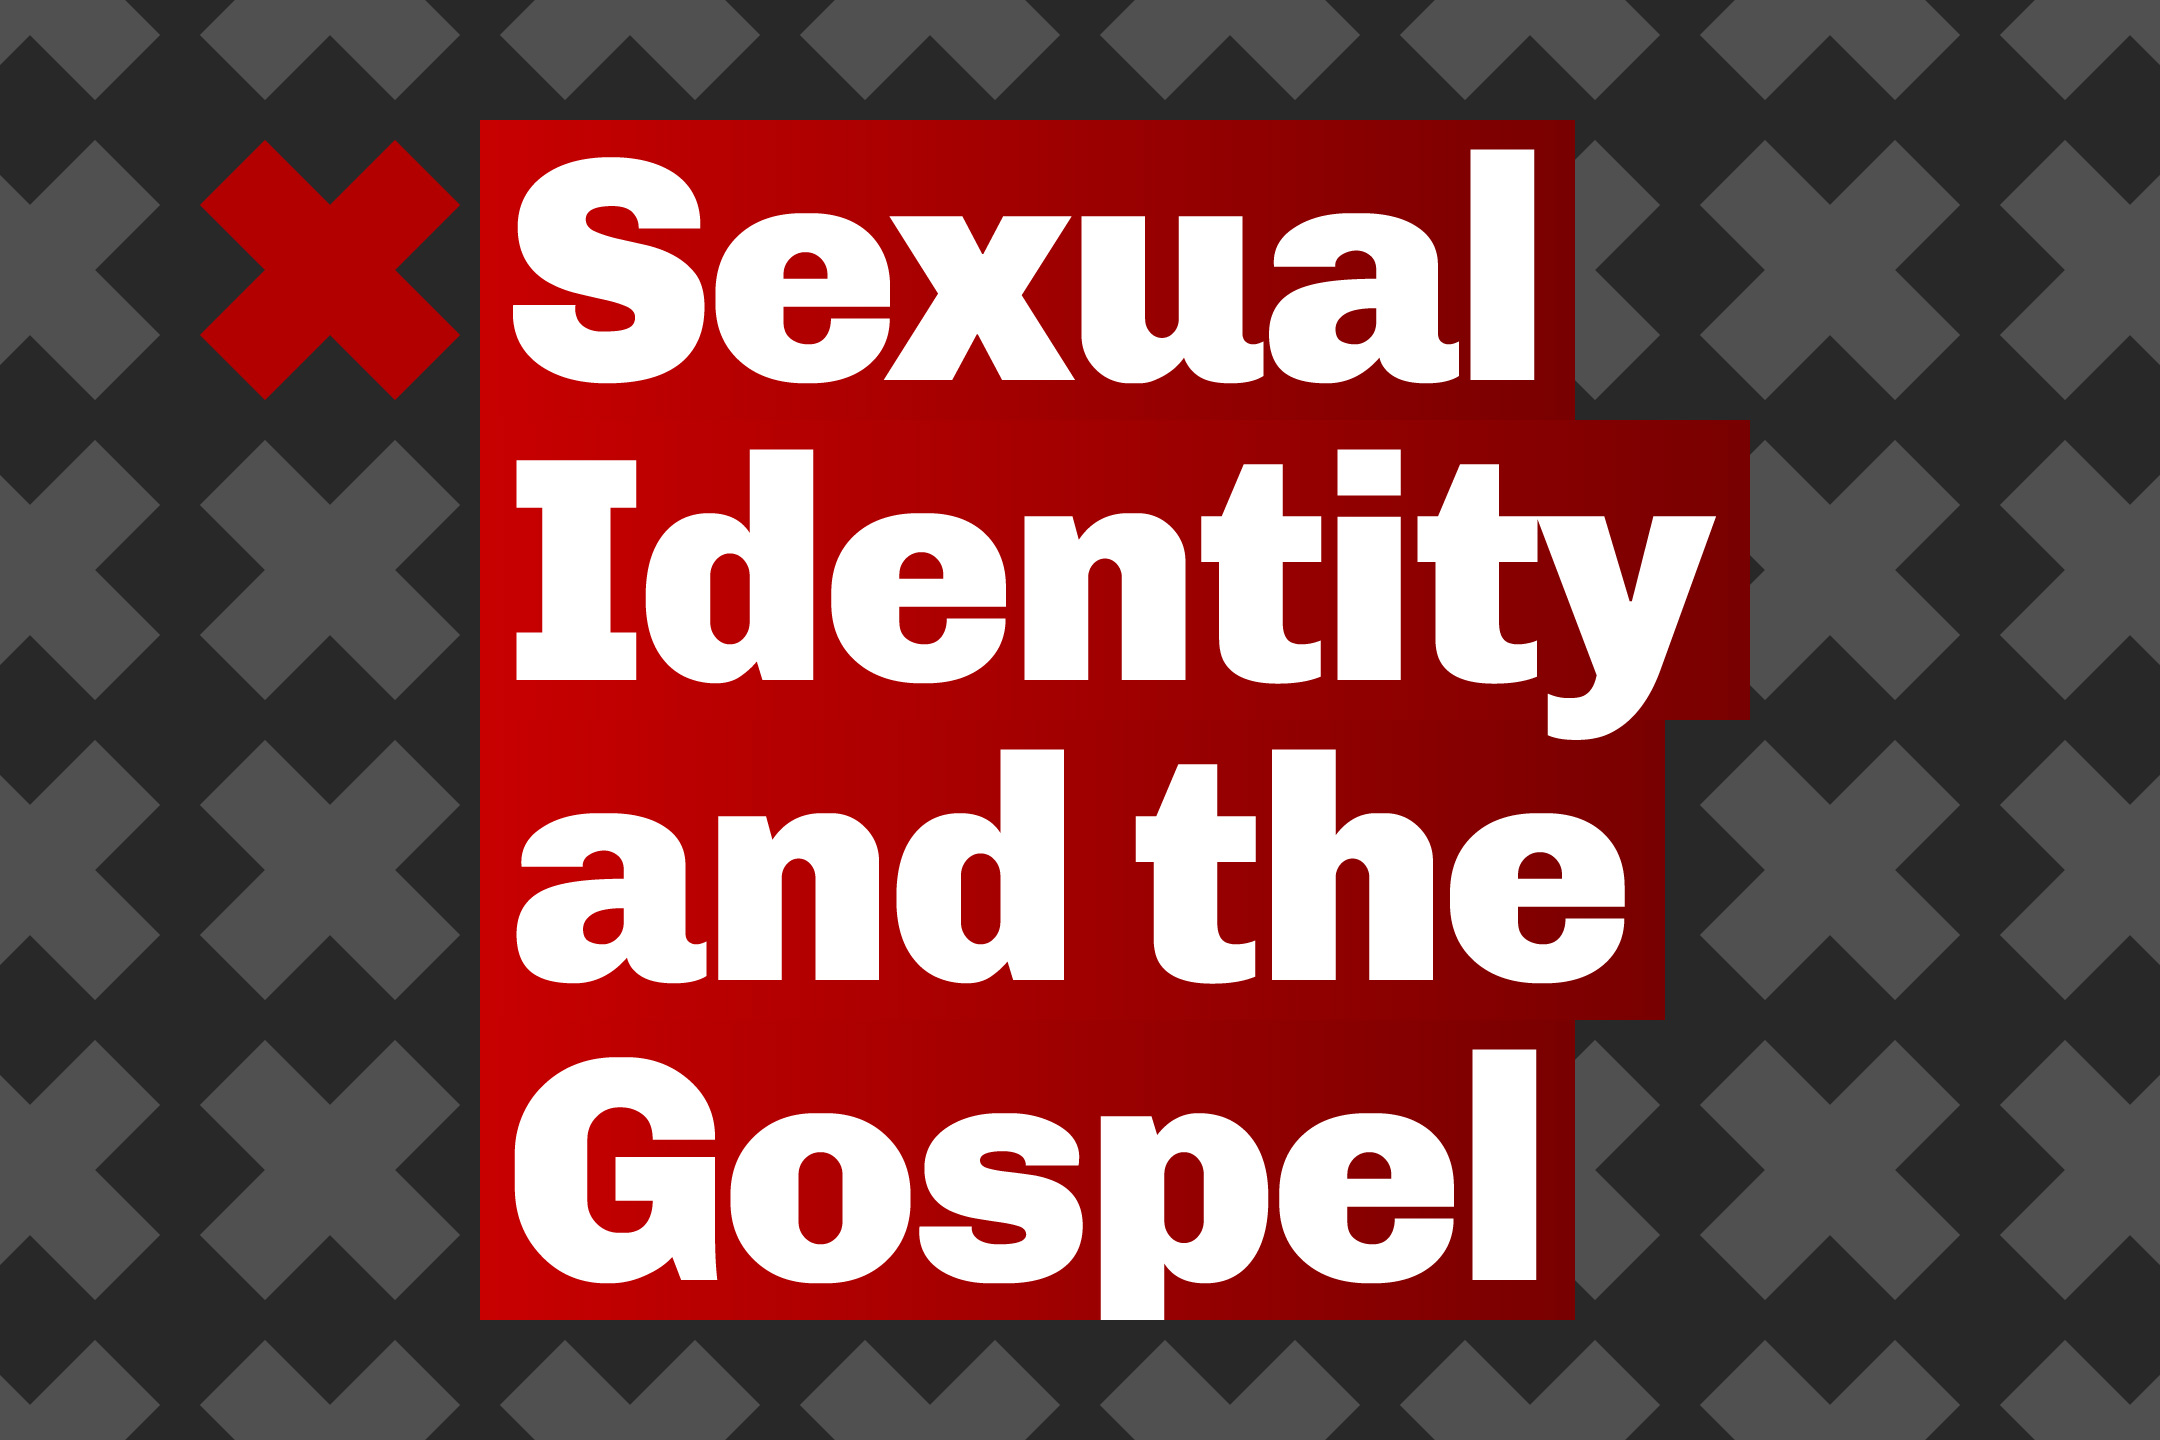 DGT-Promo-C-SexualIdentity.jpg